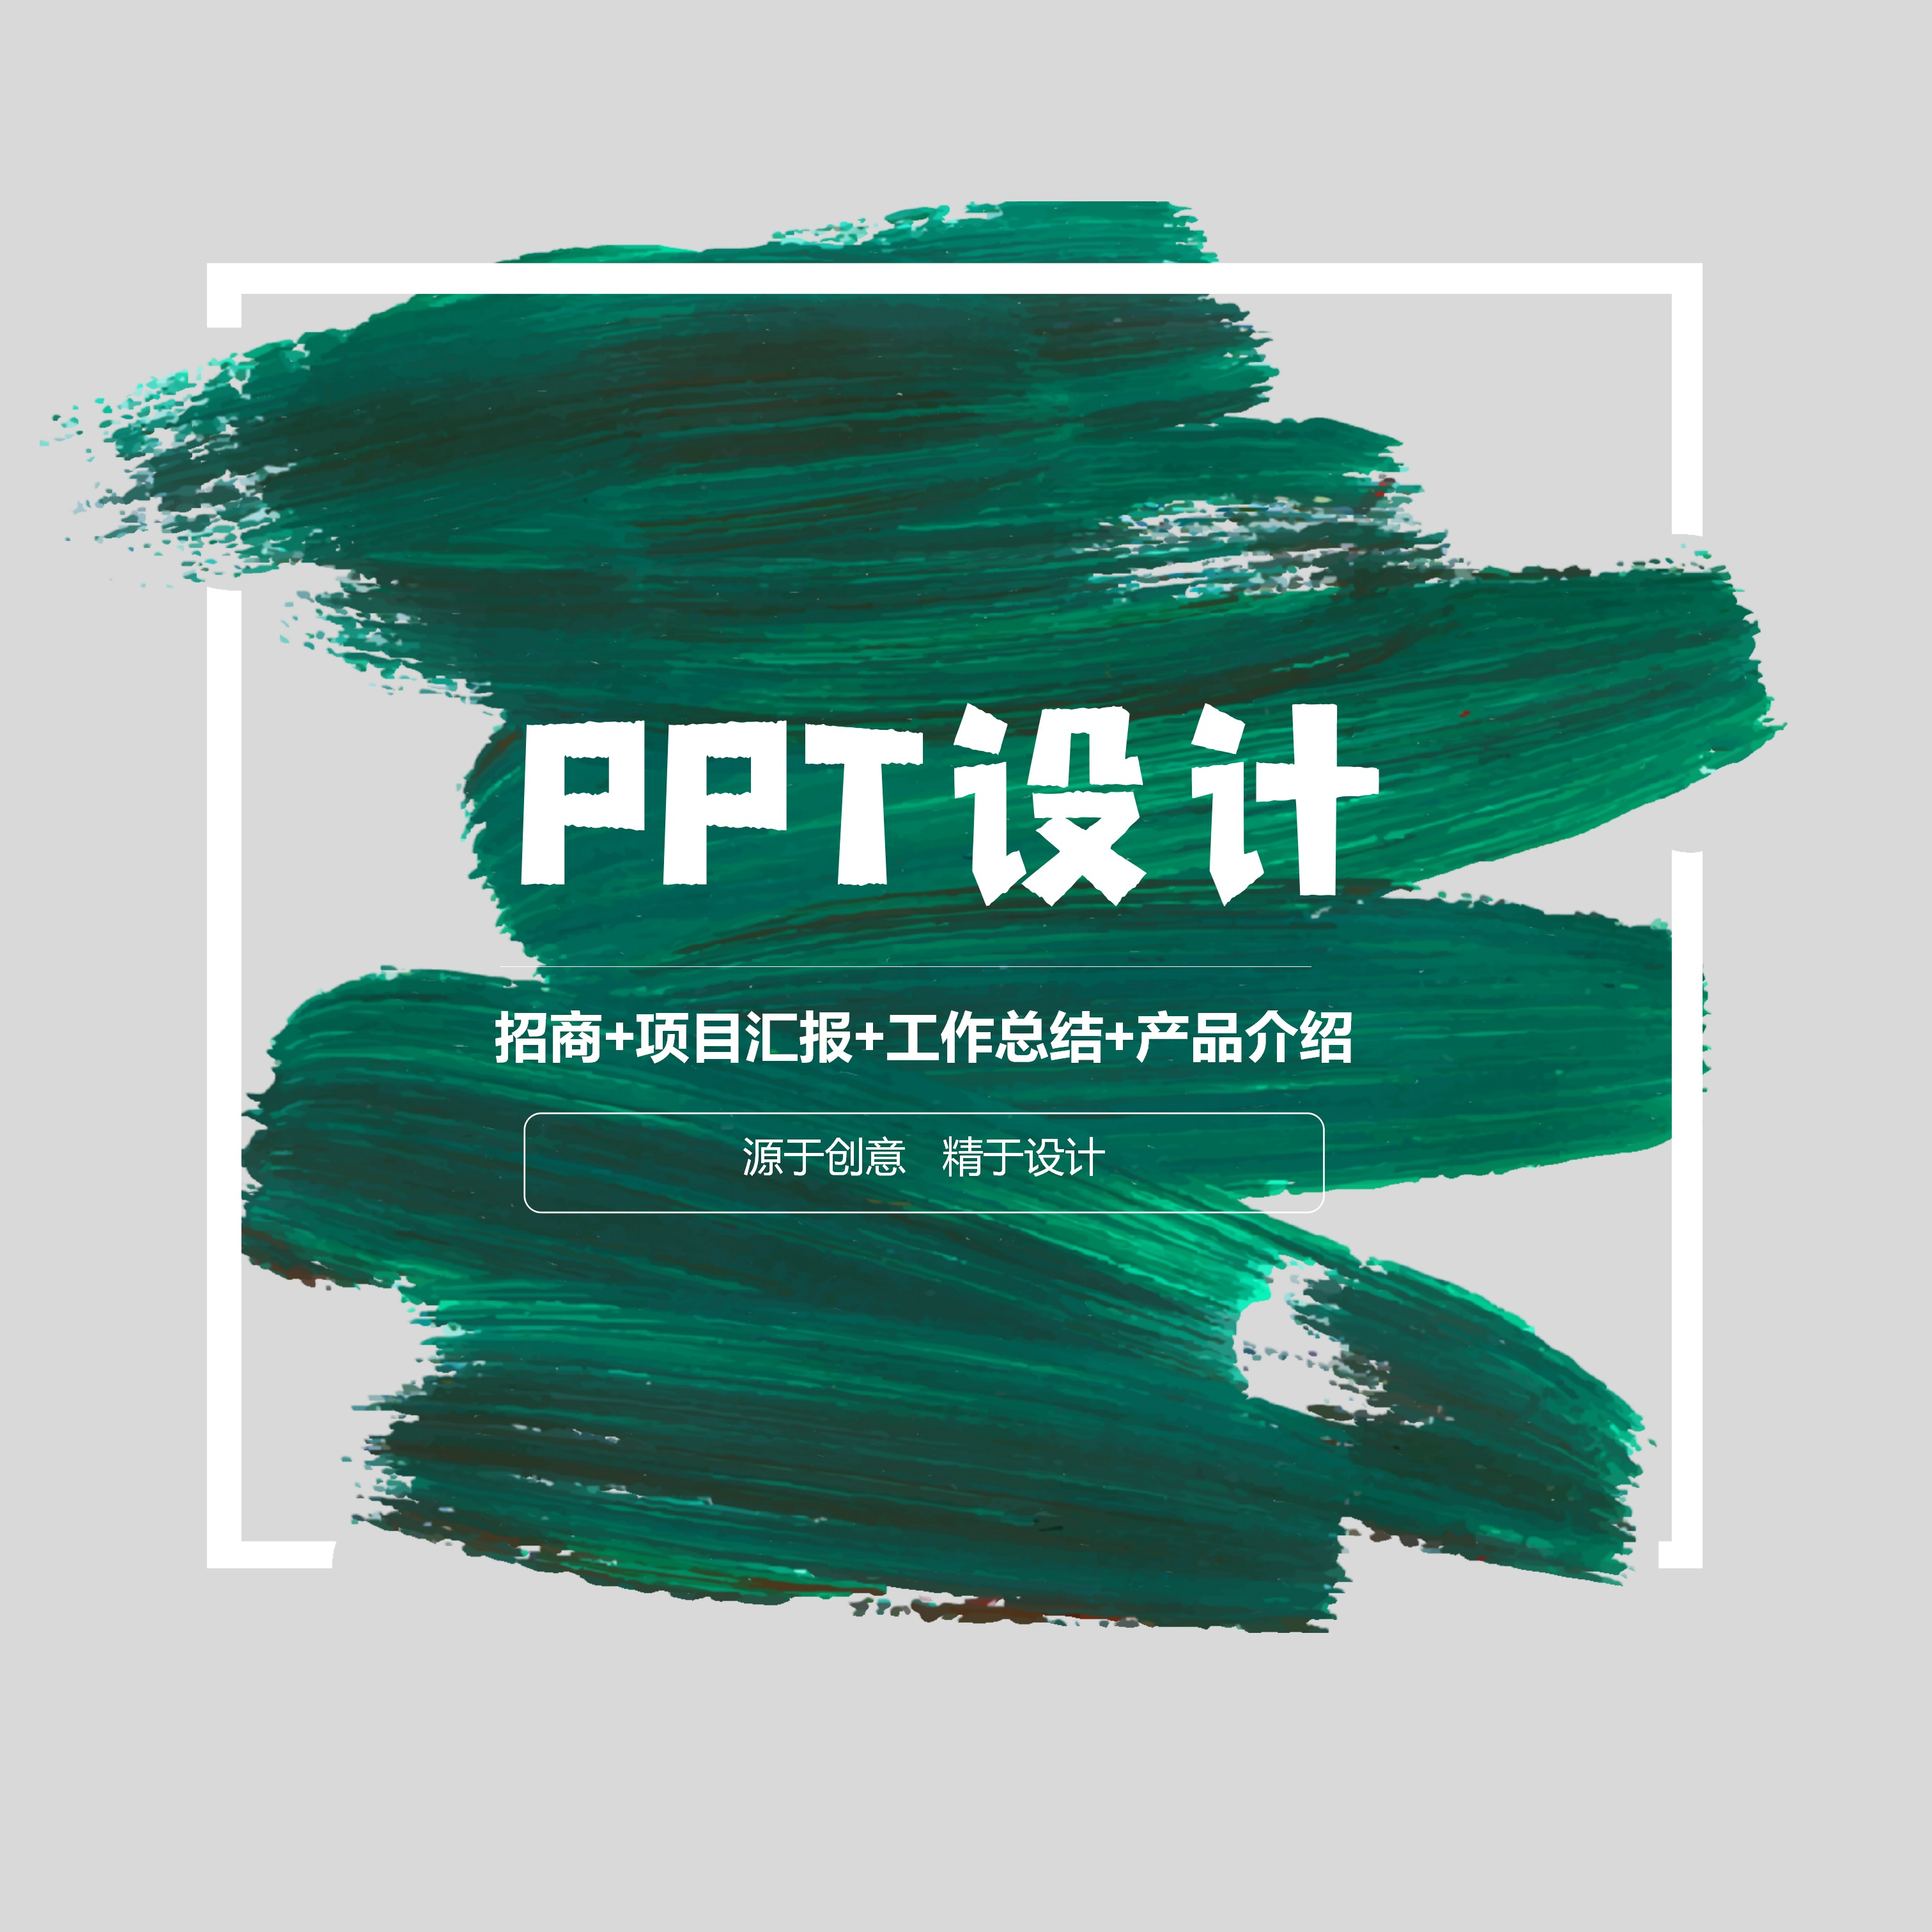 PPT制作/PPT设计/PPT美化/工作汇报/毕业答辩/培训